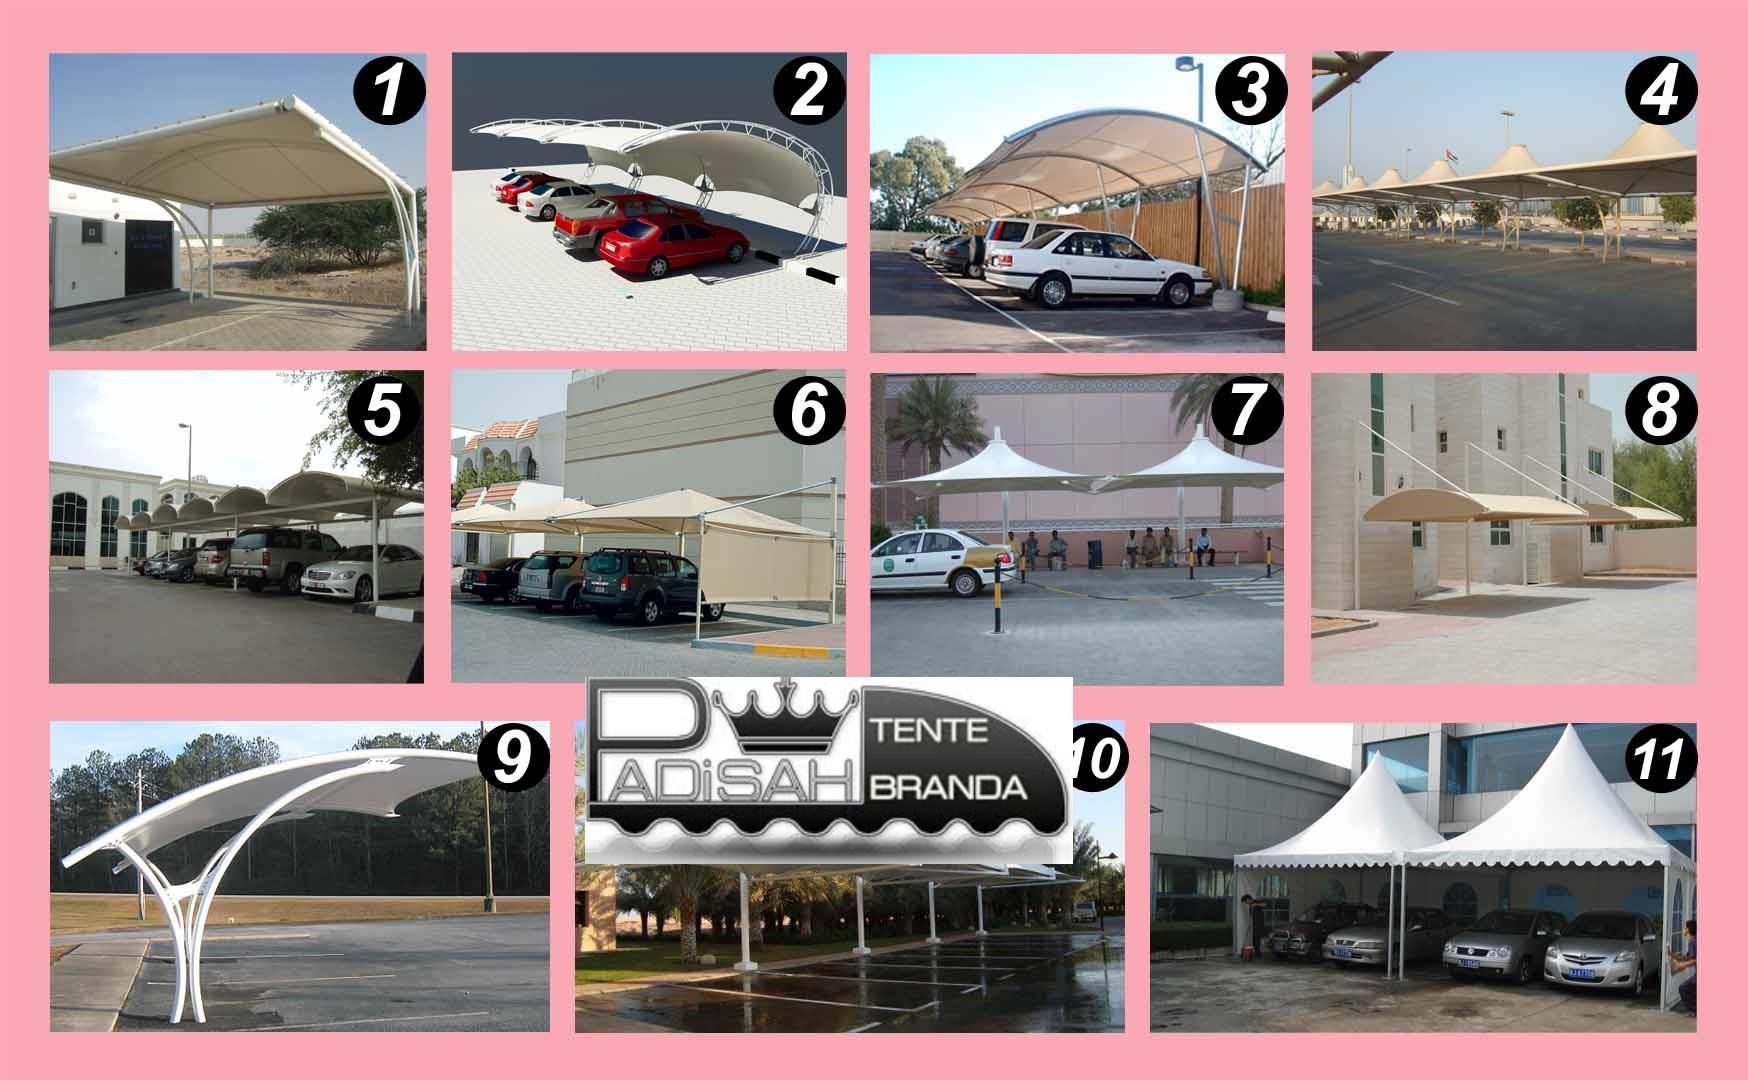 oto park tente sistemleri